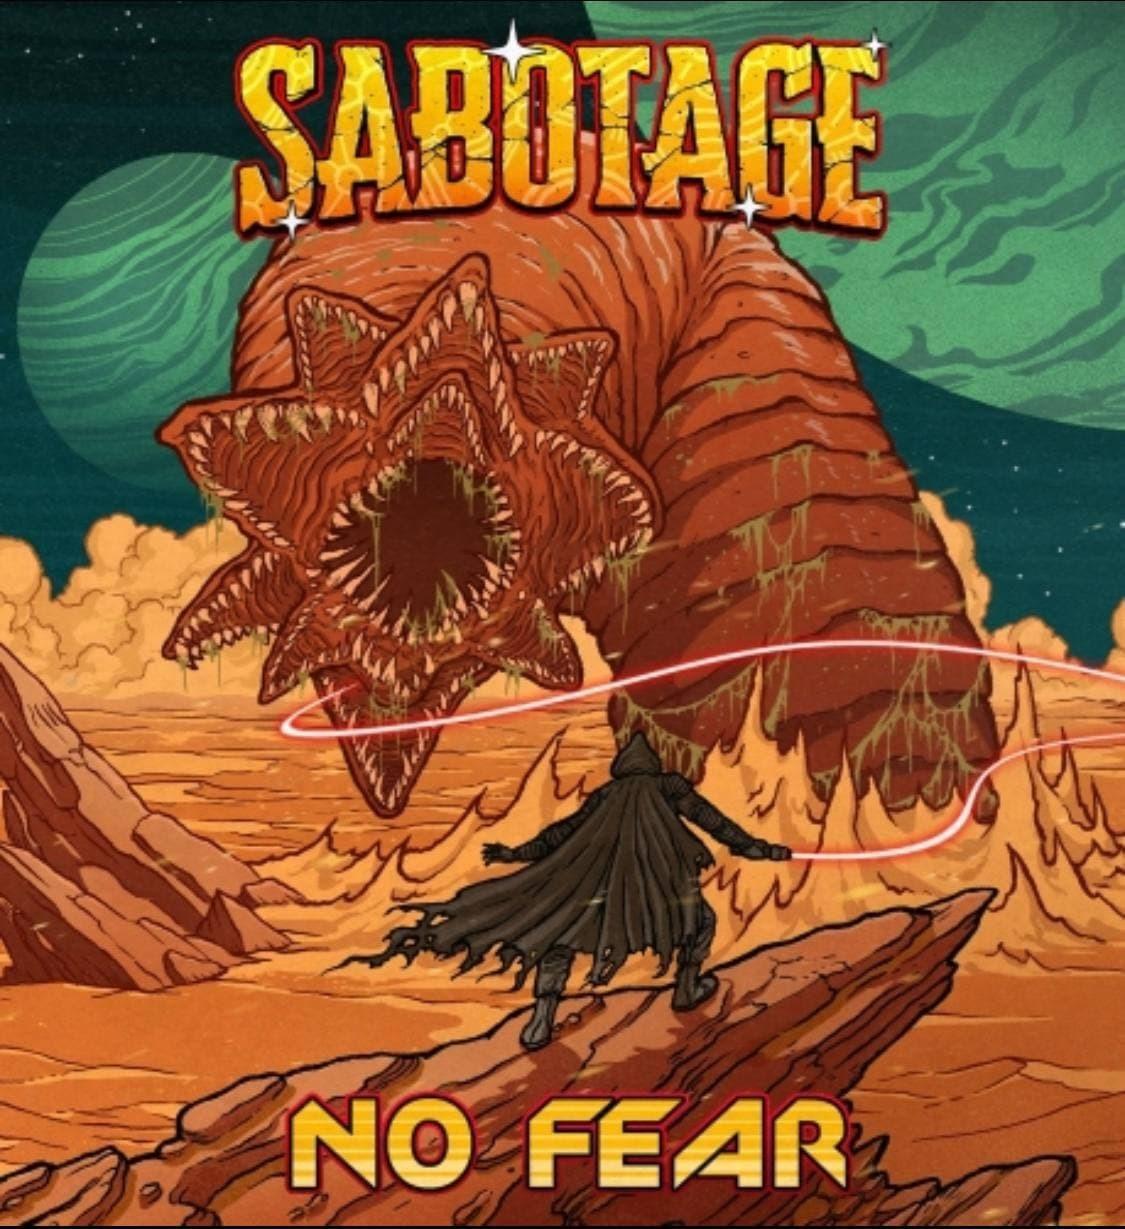 https://static-sl.insales.ru/images/products/1/5140/439653396/Пиво_Sabotage_No_Fear.jpg